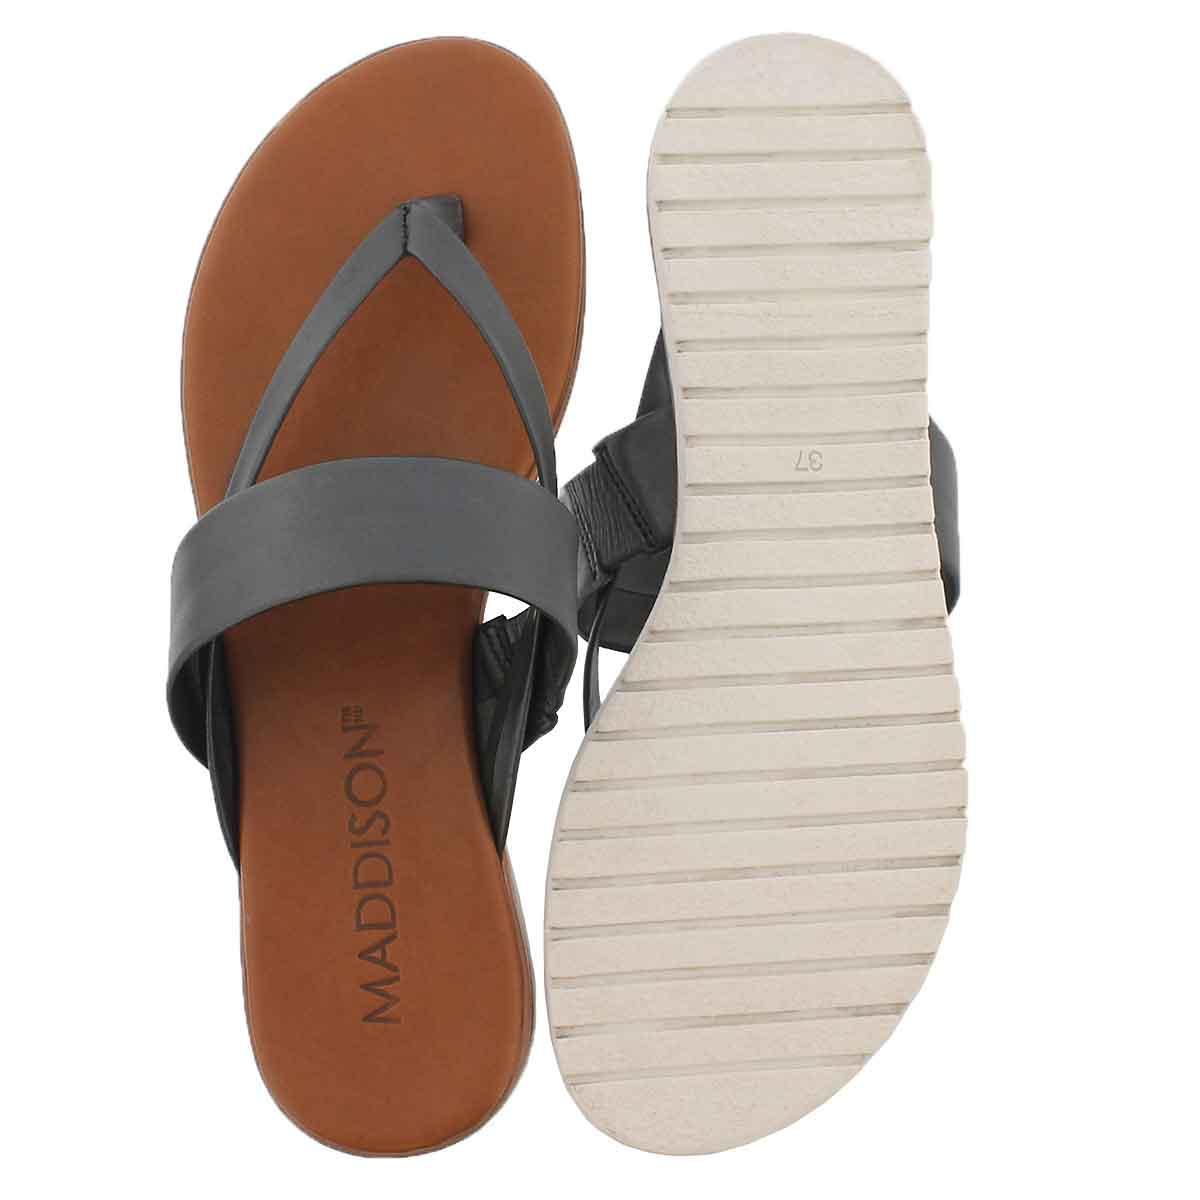 Lds Giselle black thong sandal